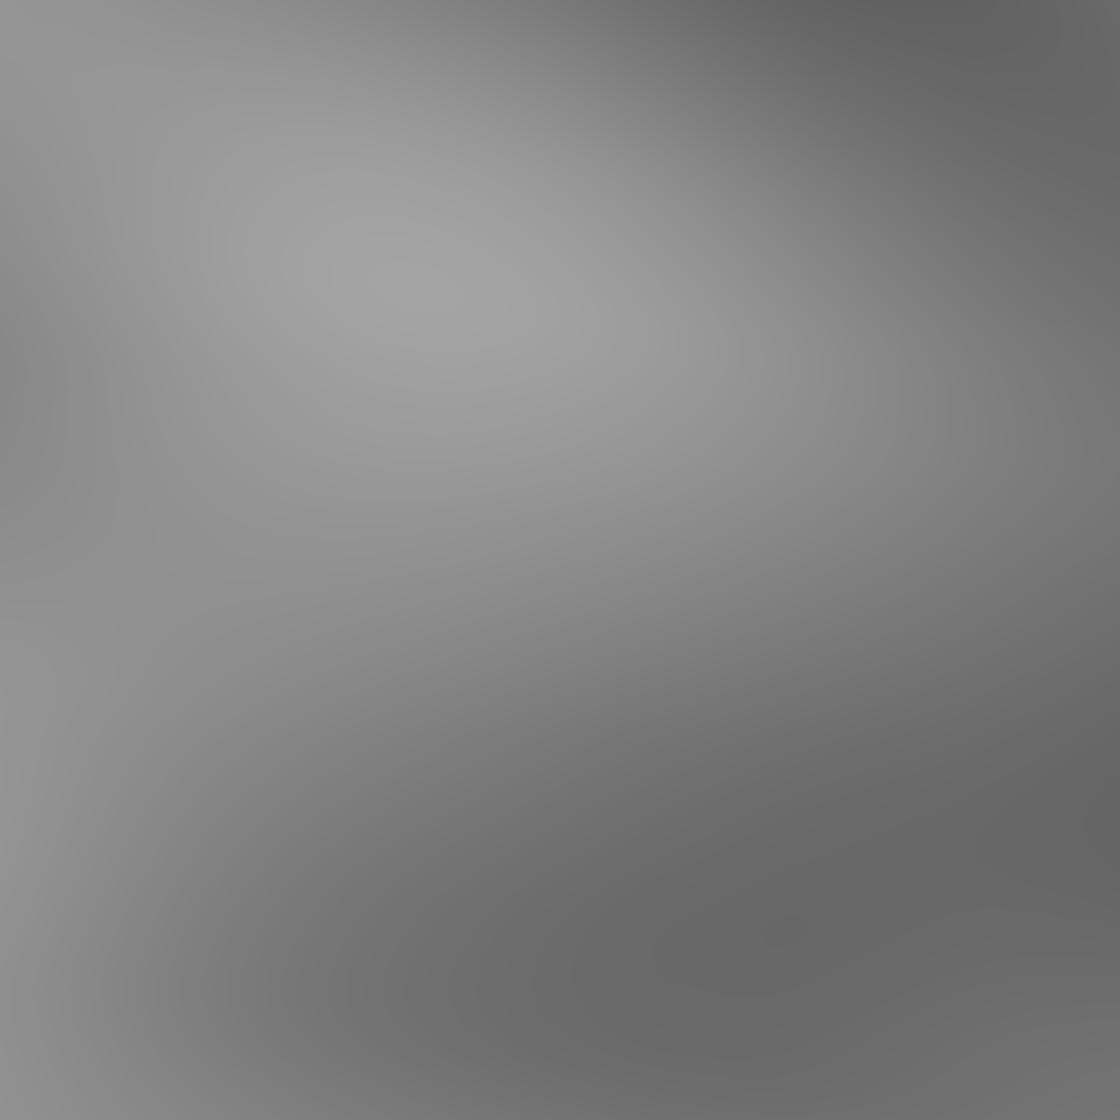 iPhone Angle Photo 05